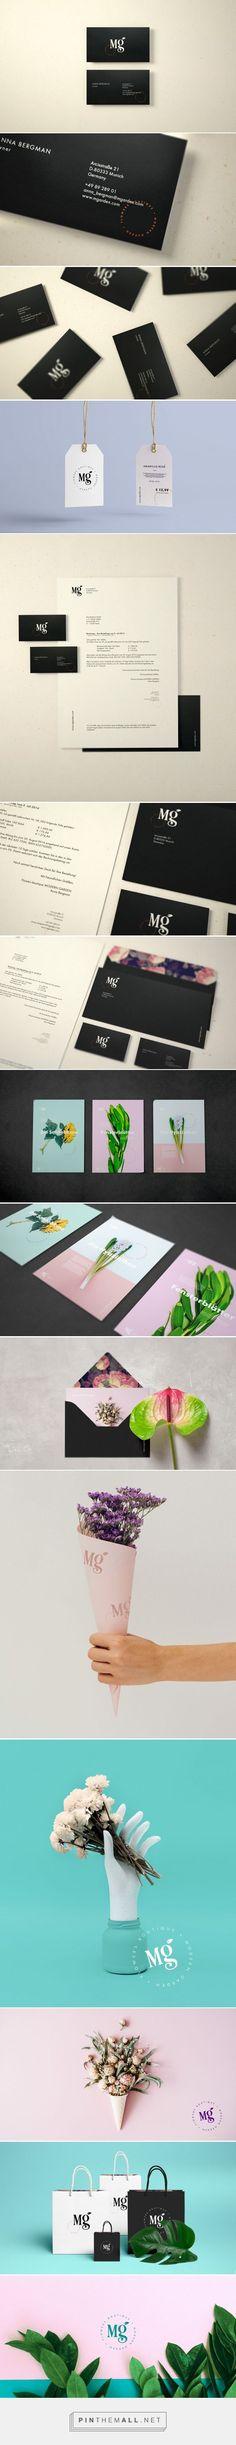 Modern Garden Creative Flower Boutique Branding by RYSKA Design | Fivestar Branding Agency – Design and Branding Agency & Curated Inspiration Gallery